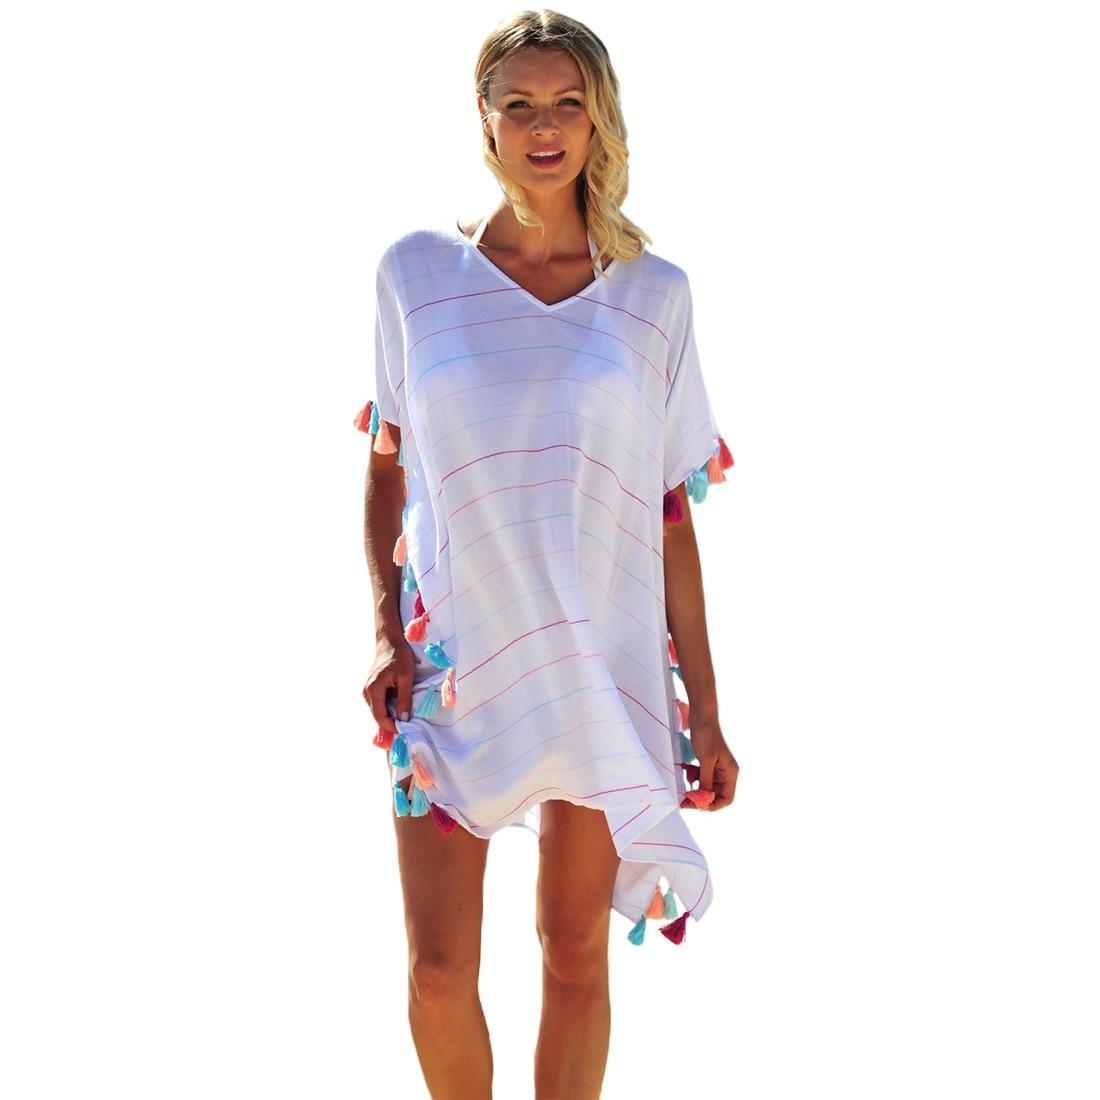 Blouses & Shirts Confident Beach Printed Sexy Casual Holiday Crew Neck Women Blouse Swimwear Stylish Chiffon Tassel Cover Up Batwing Sleeve Summer Bikini